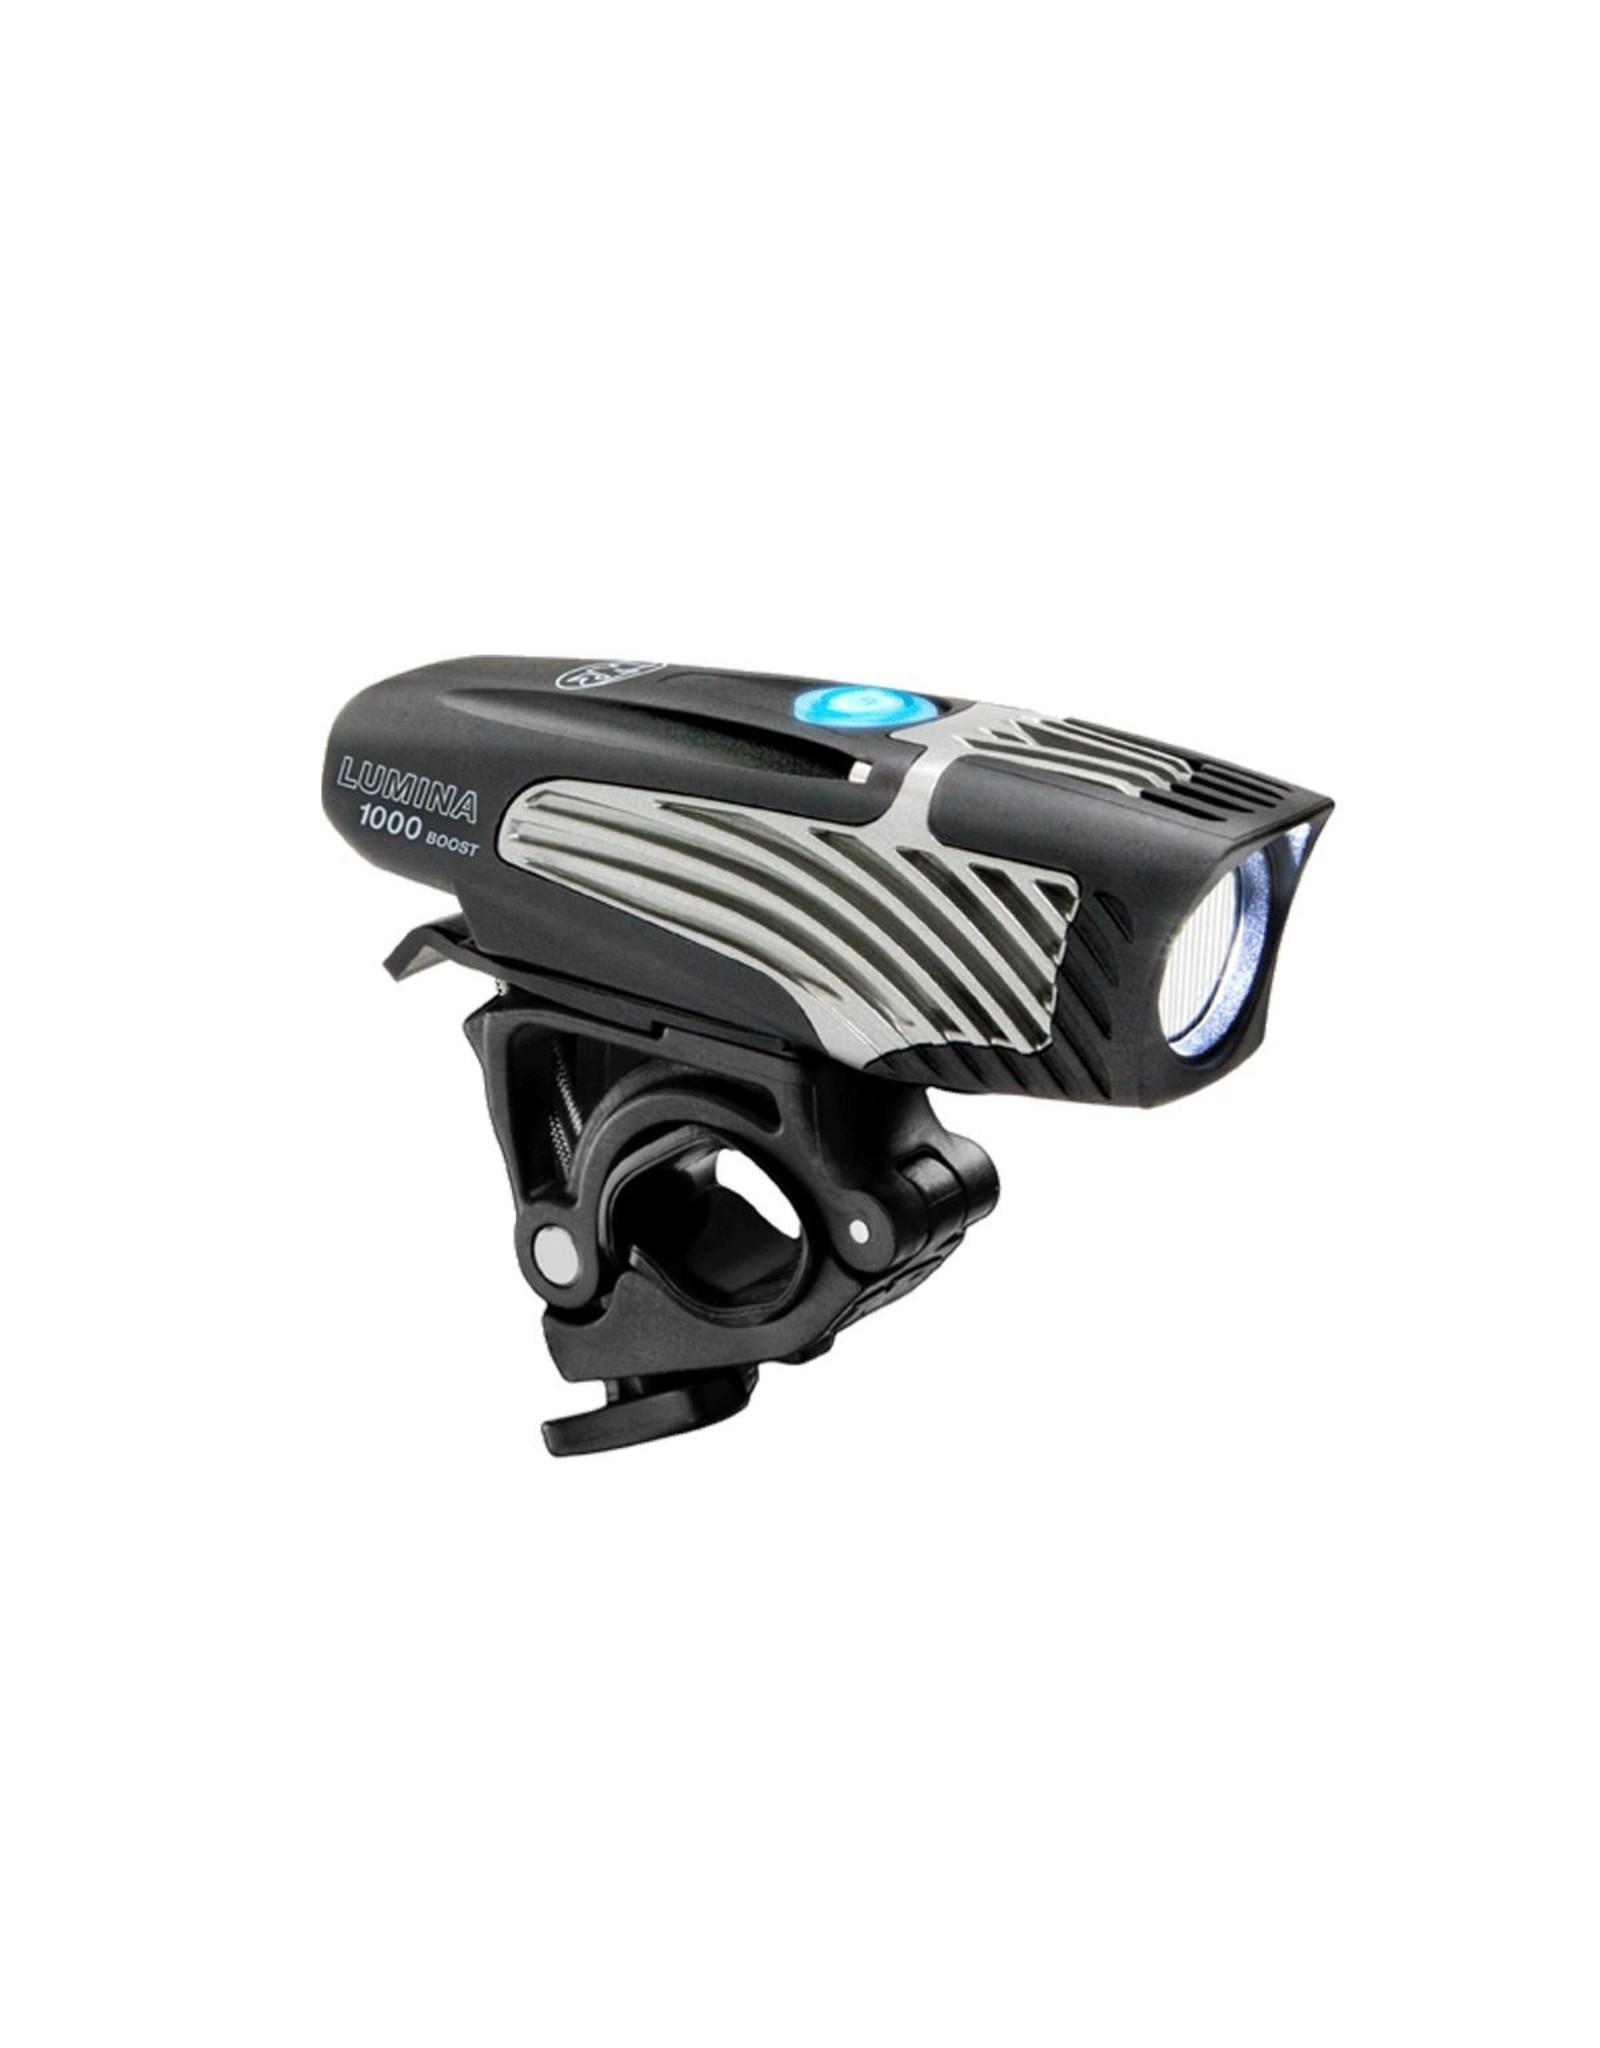 NiteRider Lumina 1000 Boost Front Light: Black